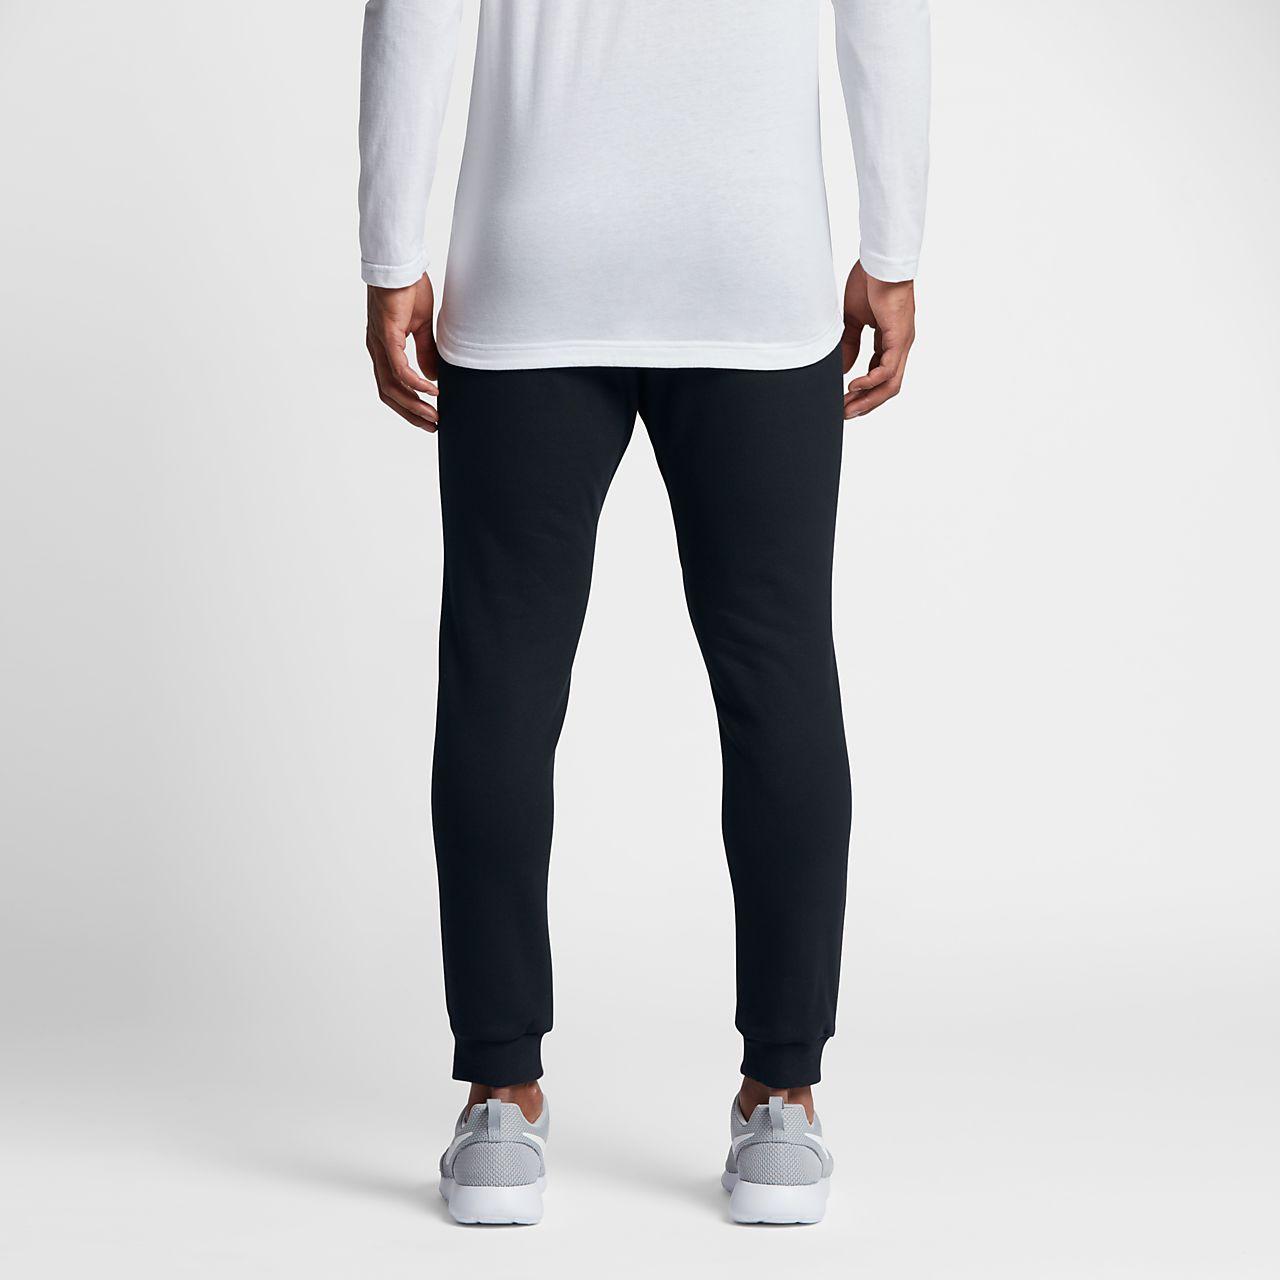 4feac862fee Pantalon de jogging Nike Sportswear Club Fleece pour Homme. Nike.com BE